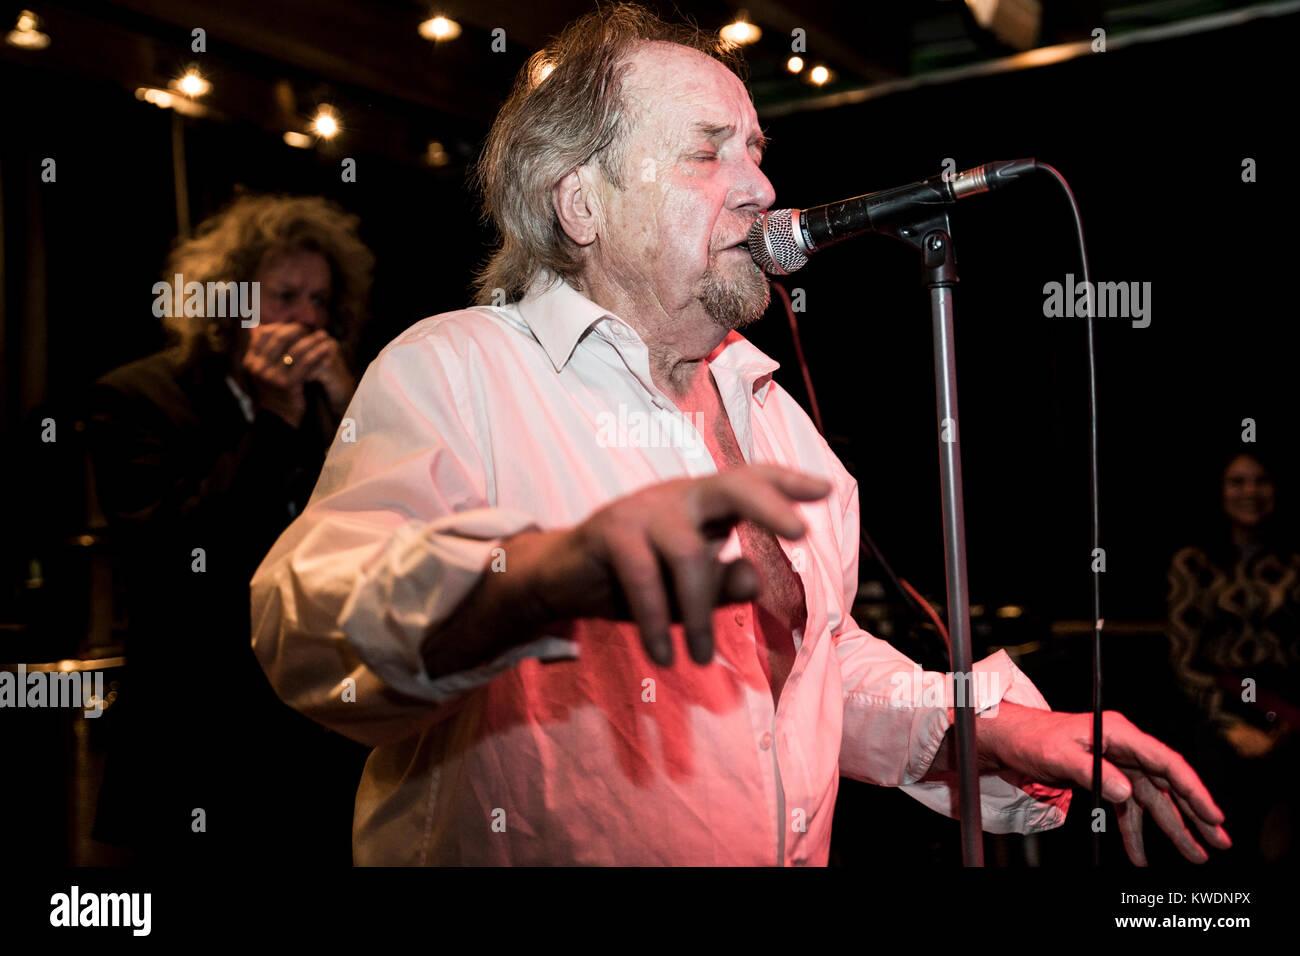 Barcelona, Spain. November 30, 2017. Concert by The Pretty Things in Marula Café. Organized by A Wamba Buluba. - Stock Image